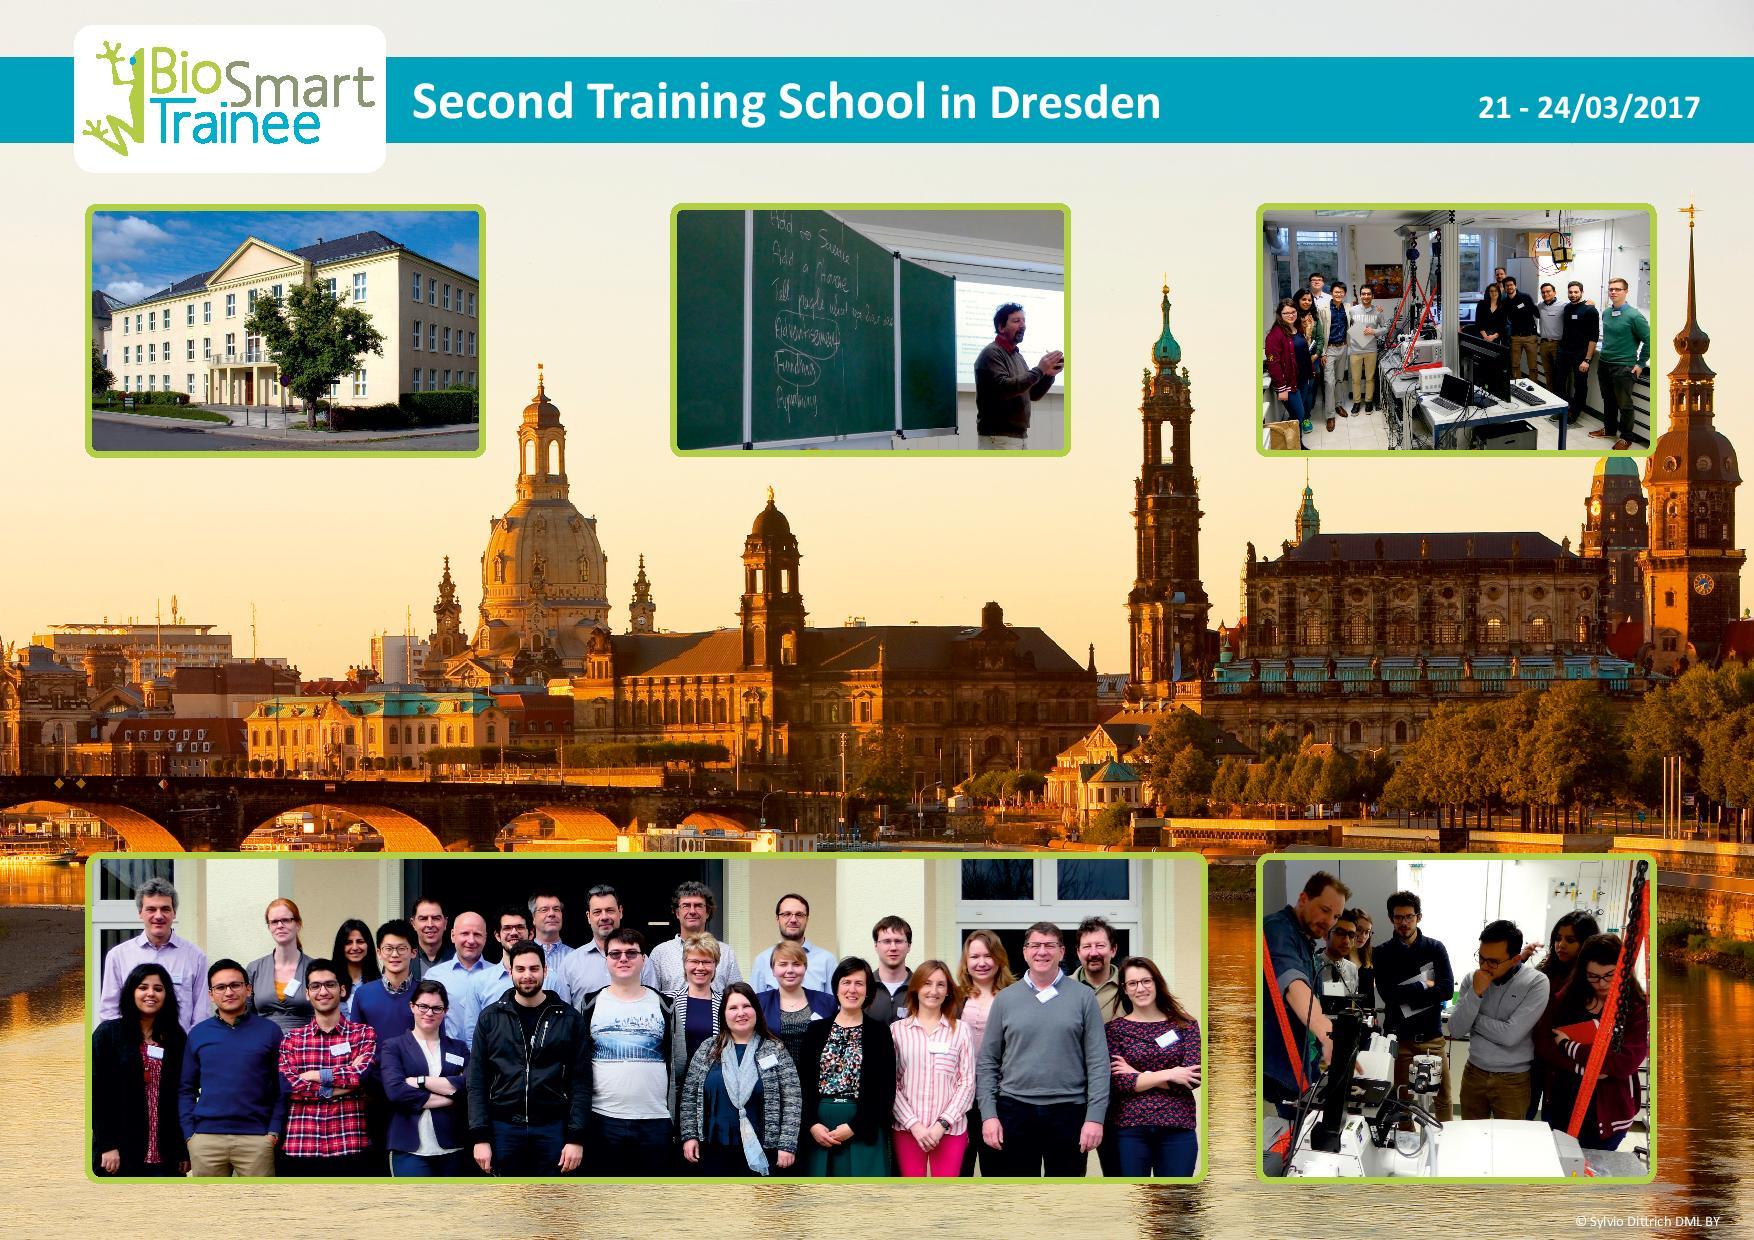 Training School 2 | BioSmartTrainee